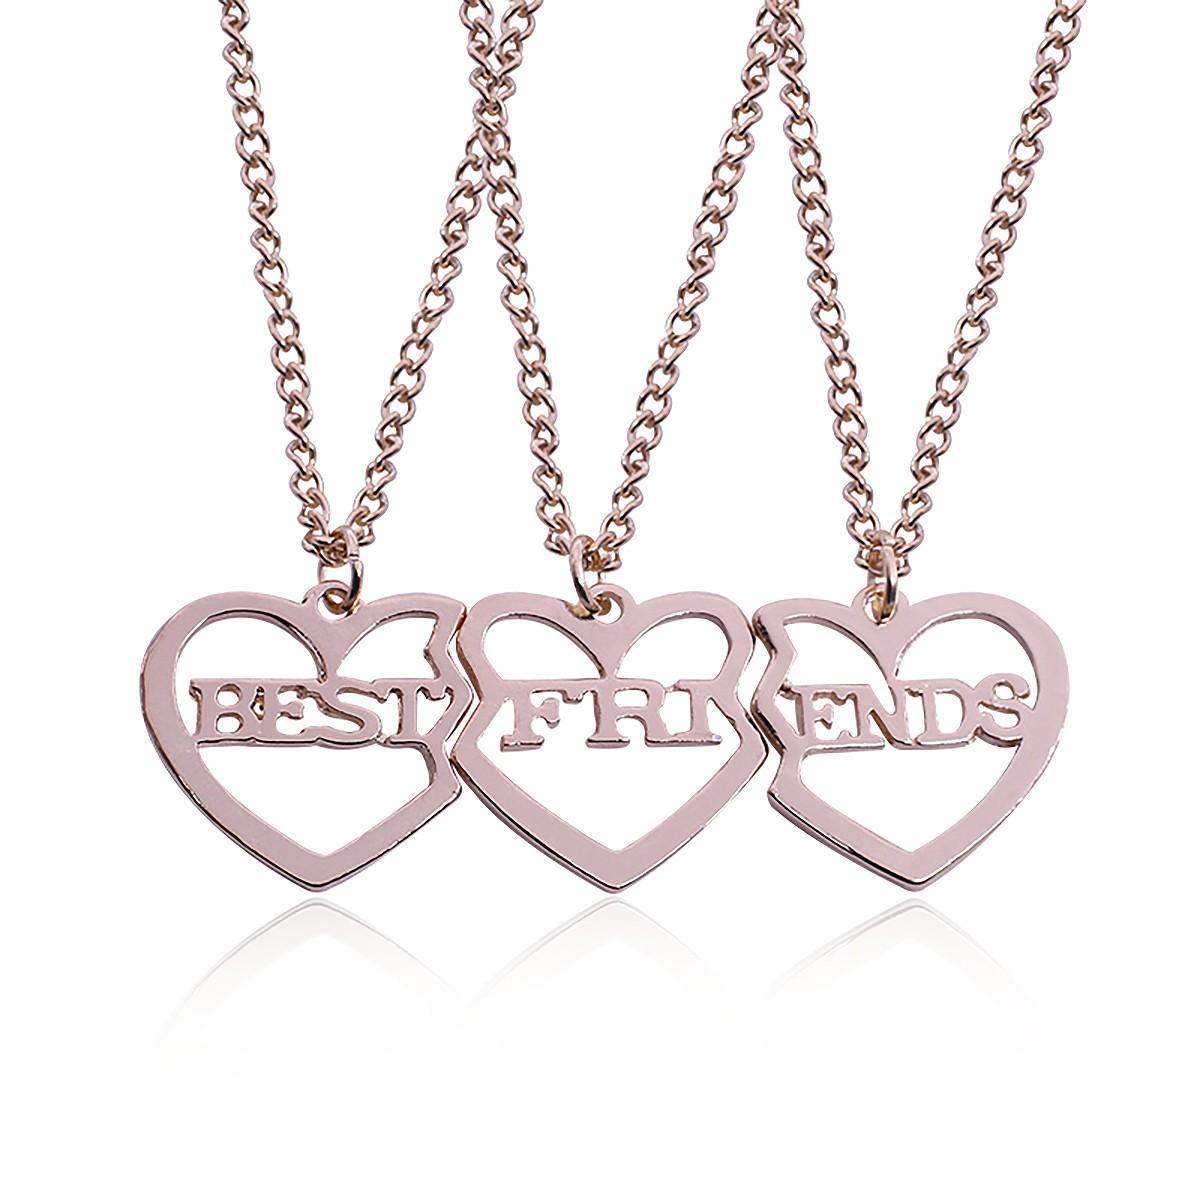 Halsketten best - fri - ends